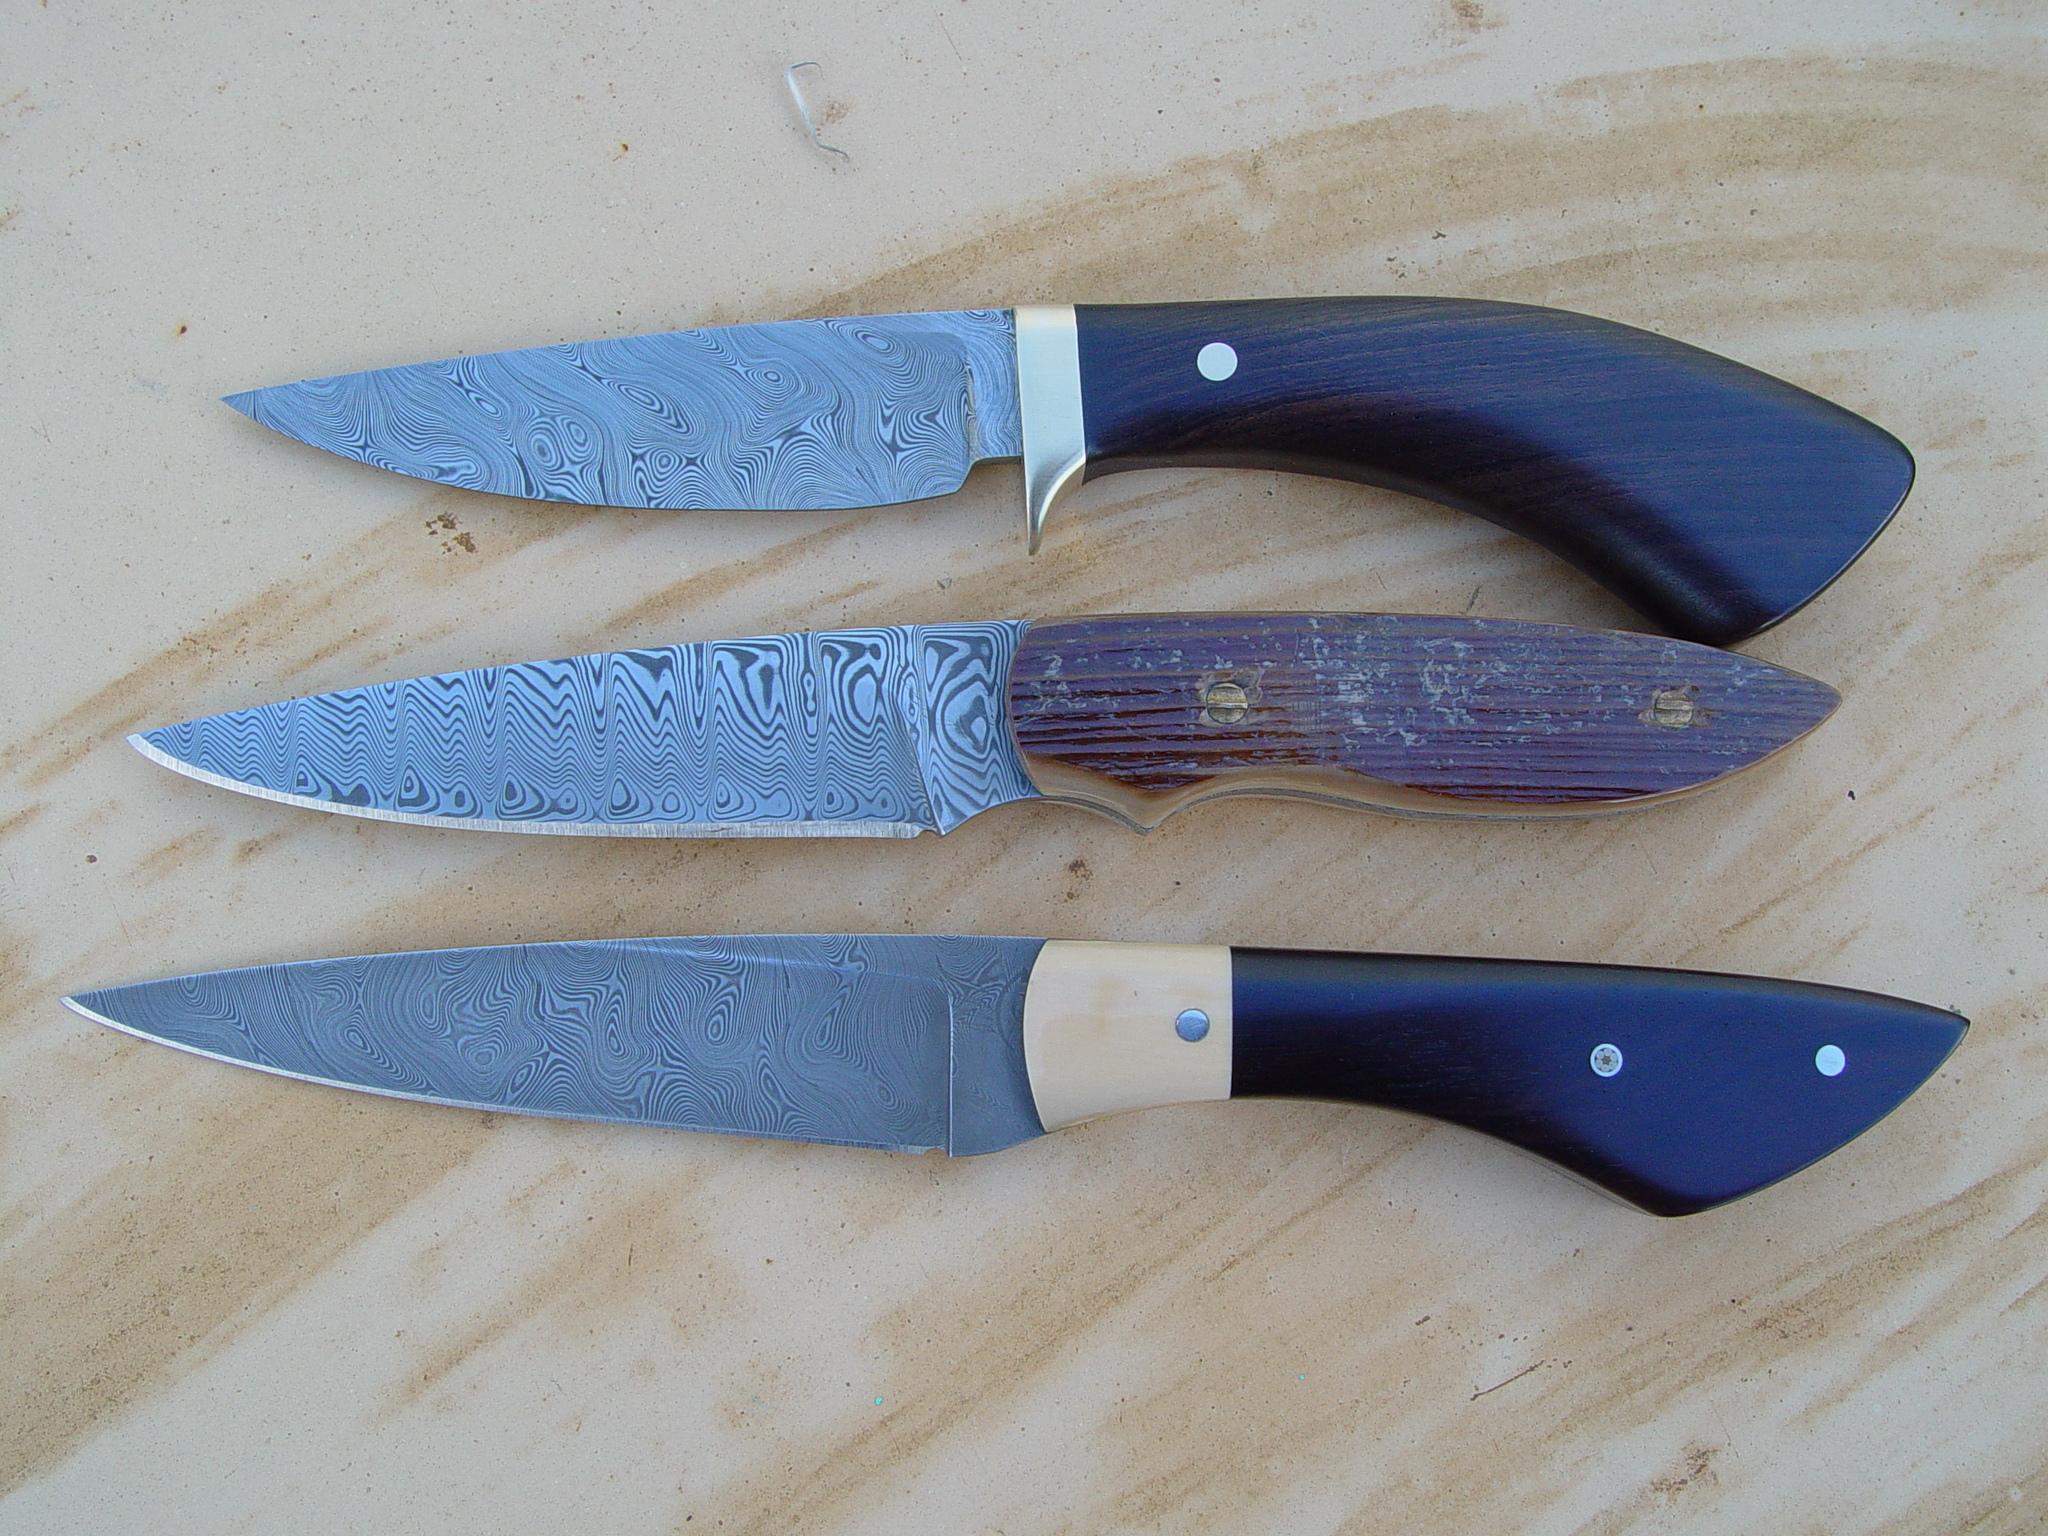 All three Bird ant Trout blades.